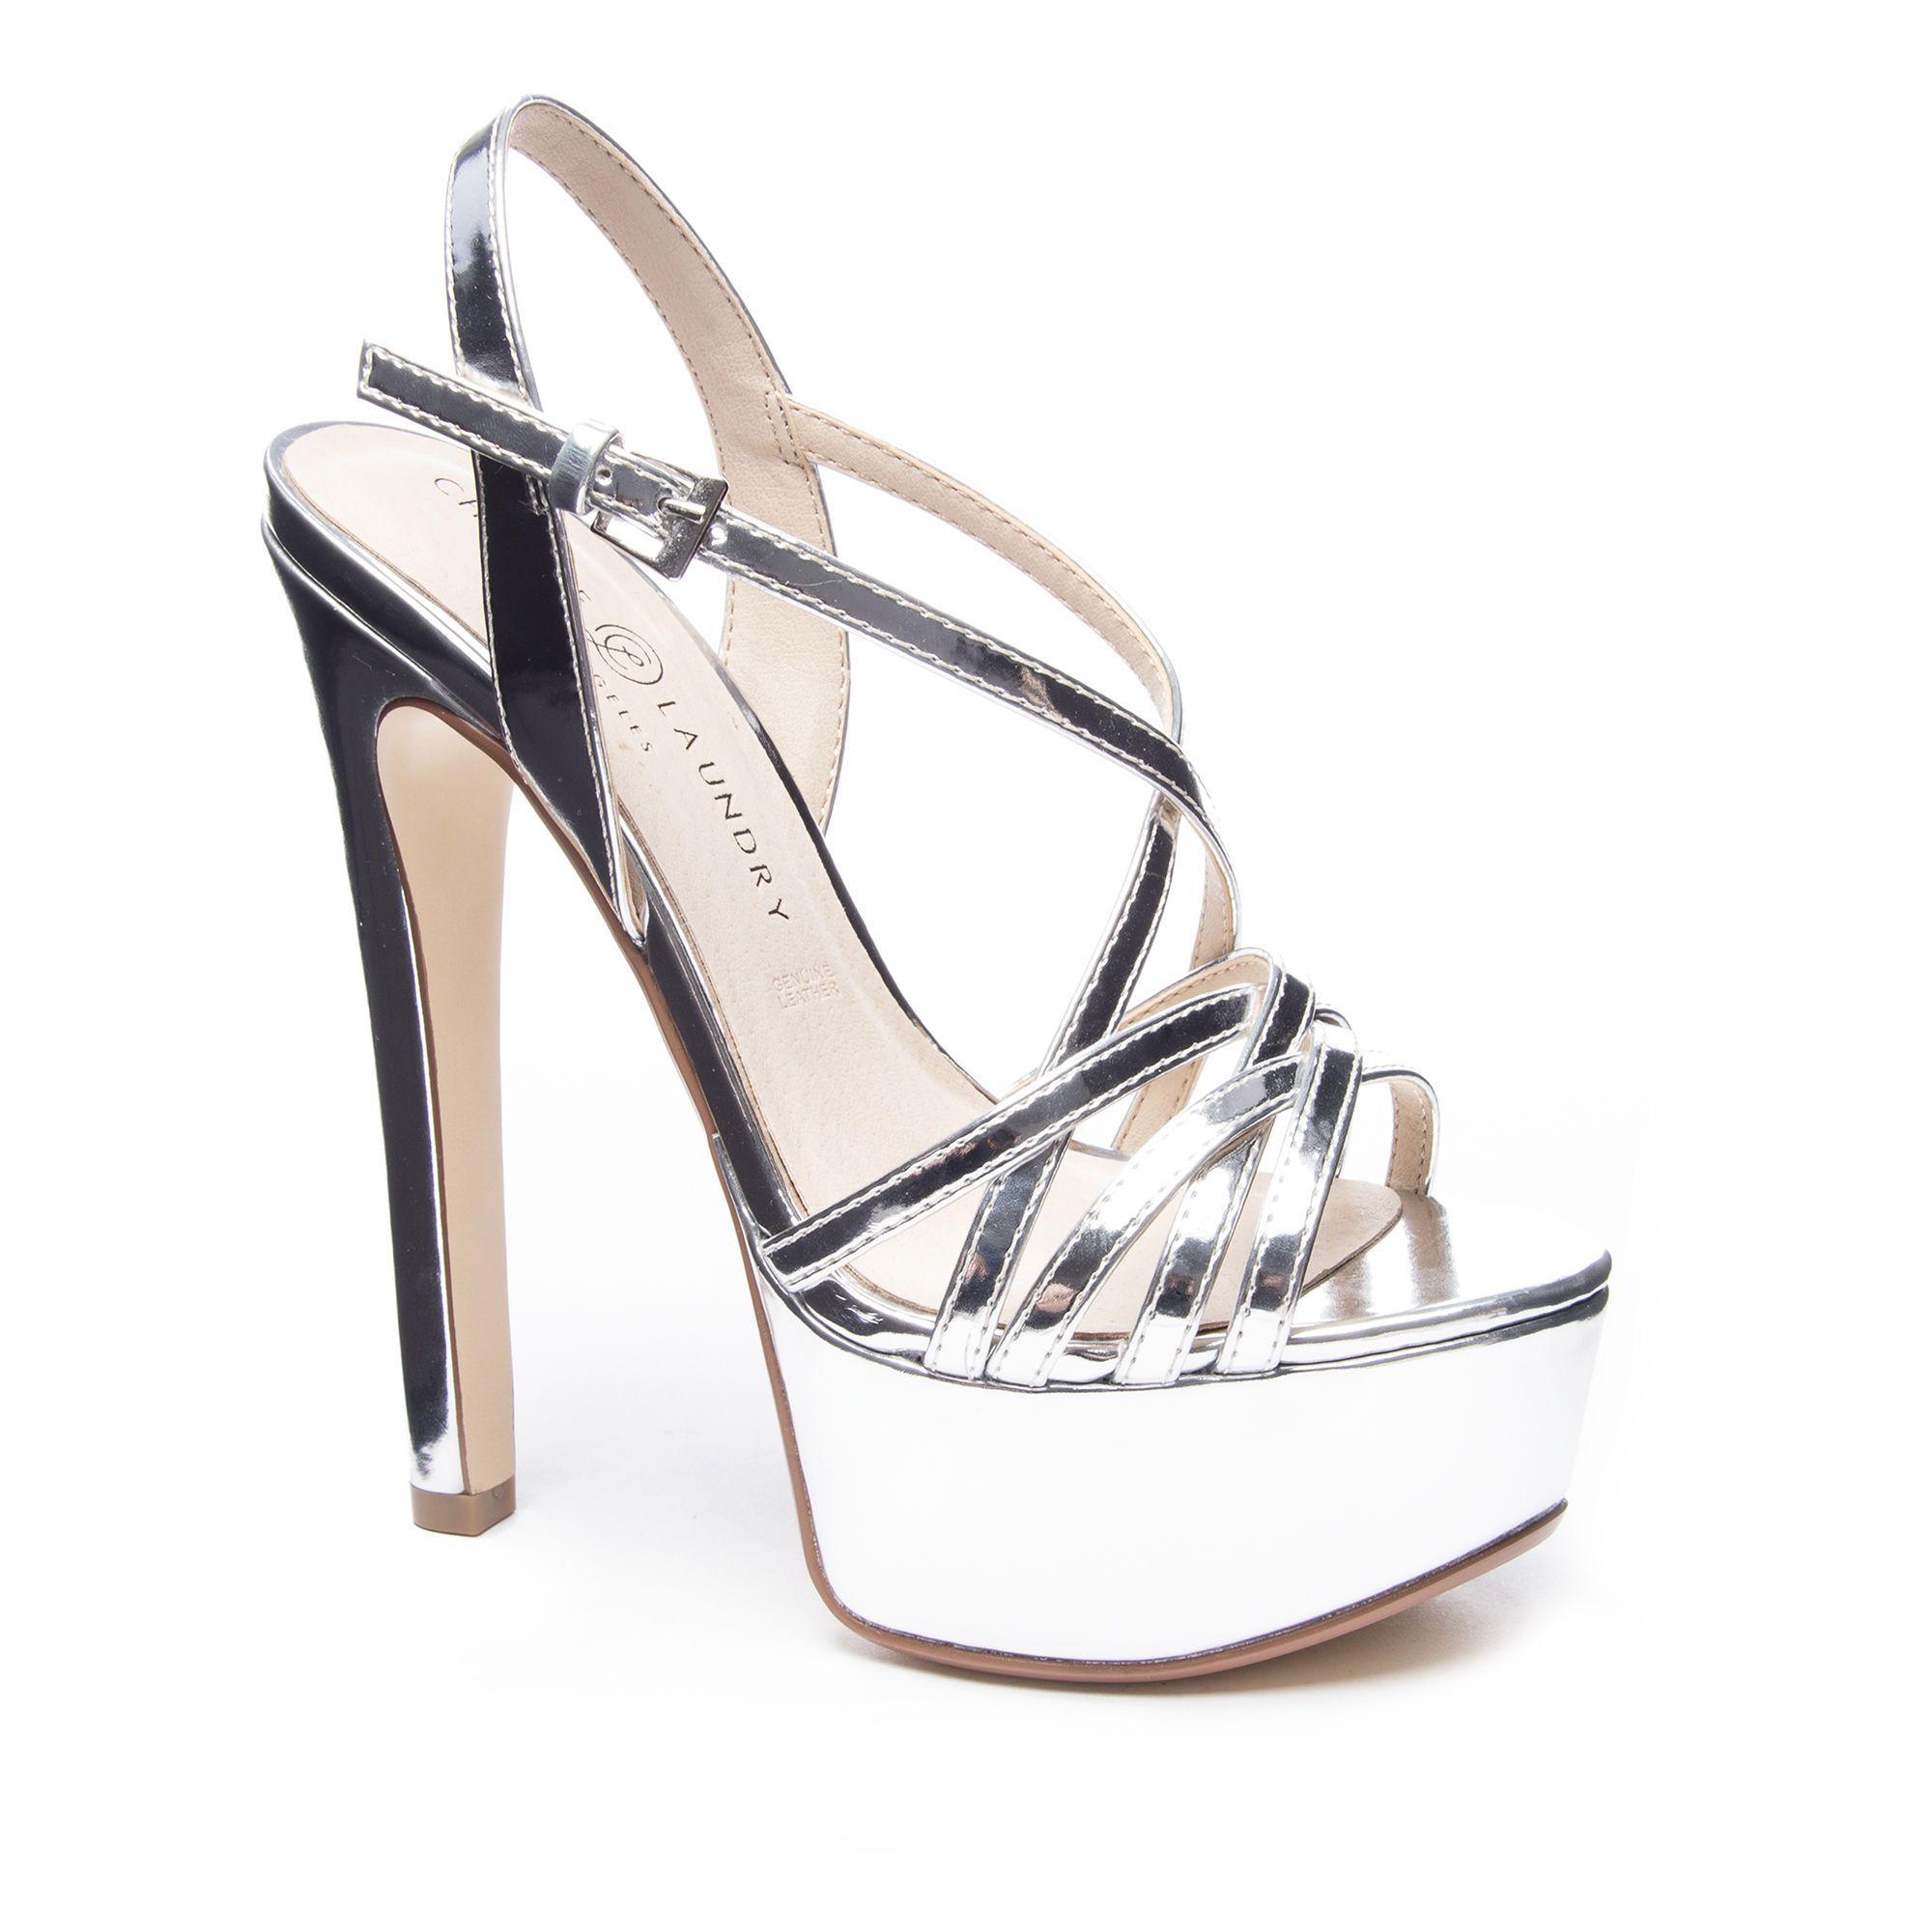 Teaser2 Platform Sandal Heels Womens High Heels Pageant Shoes